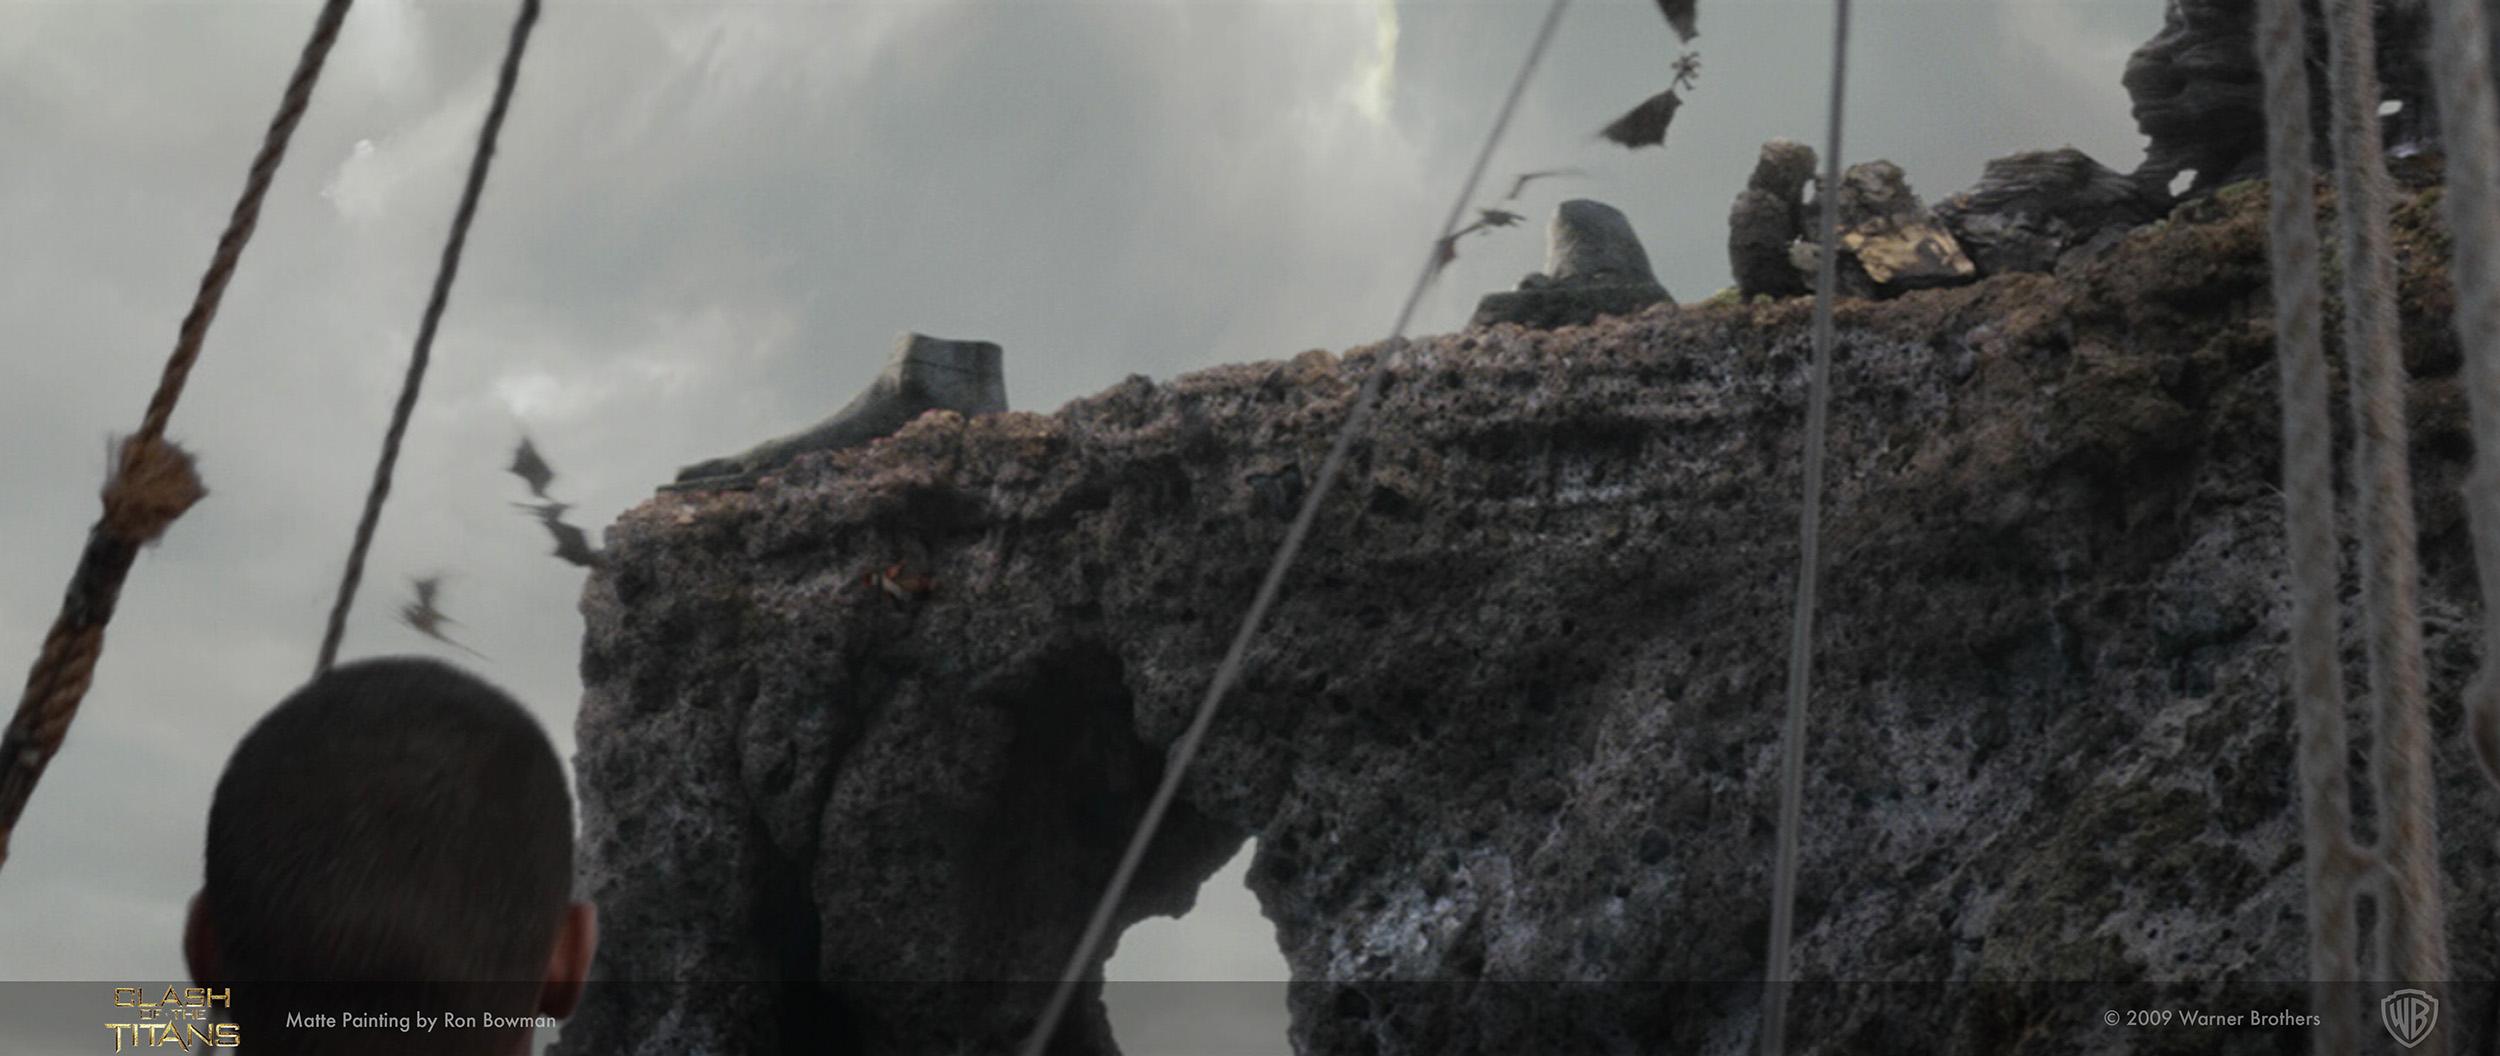 cot_cliff_comp.jpg